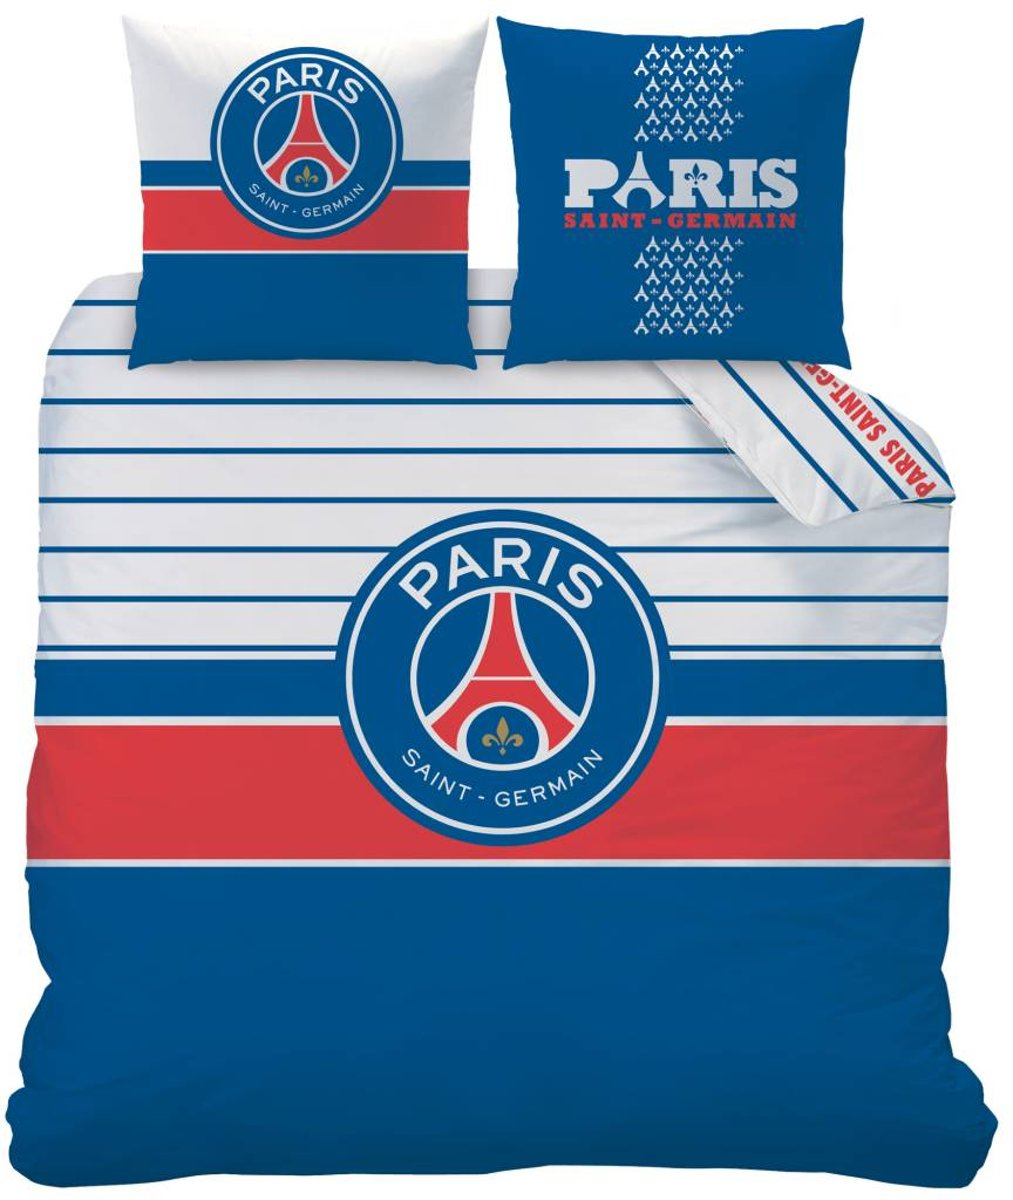 Paris Saint Germain Logo - Dekbedovertrek - Lits Jumeaux - 240 x 220 cm - Multi